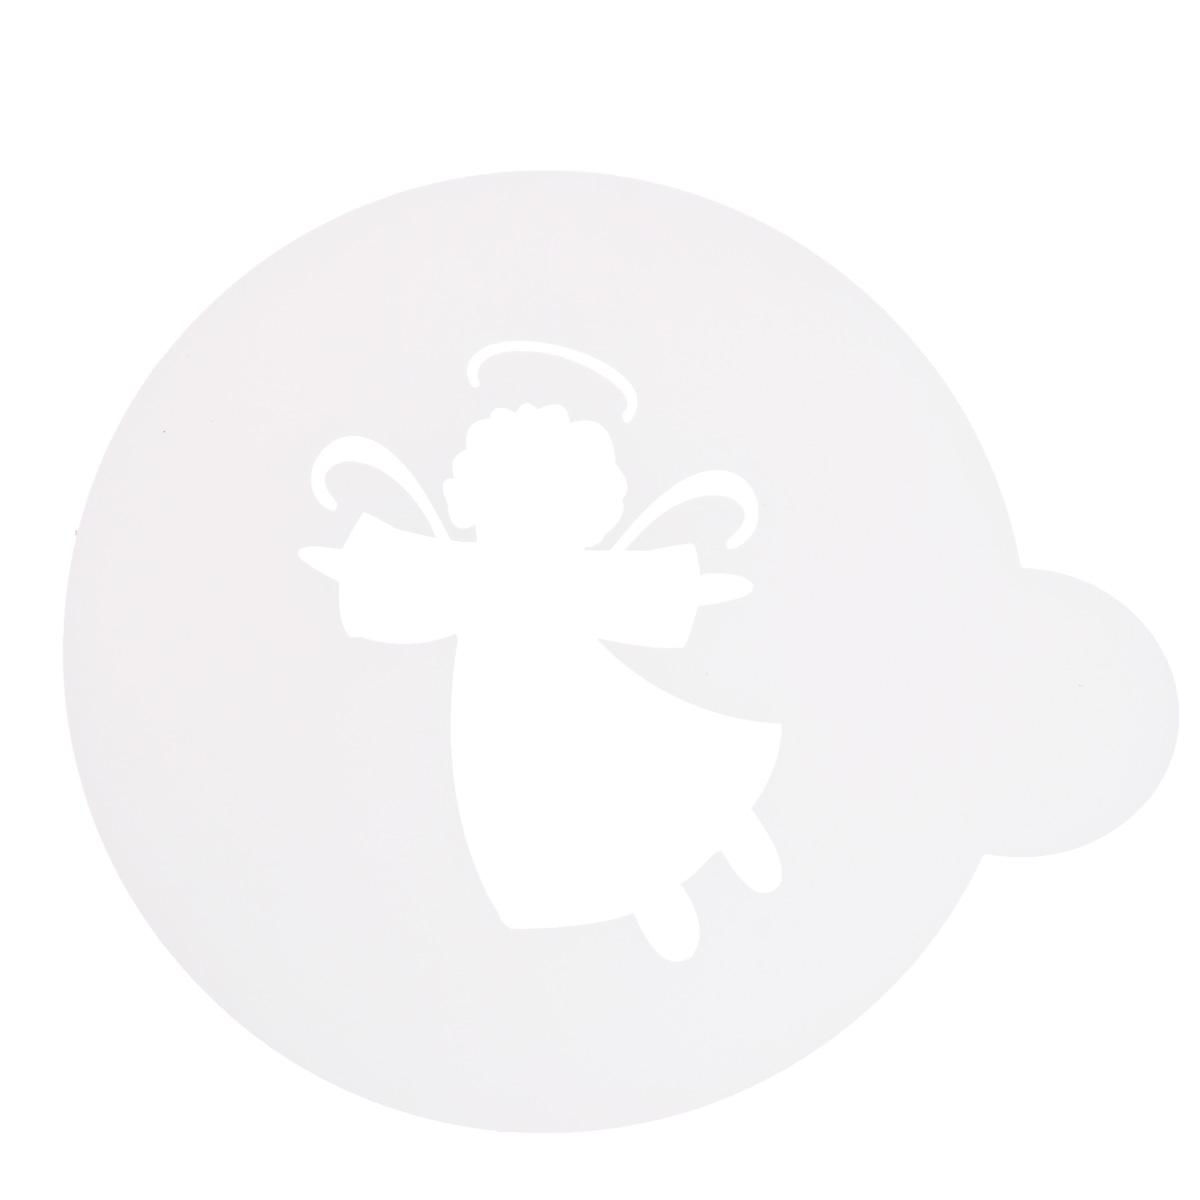 Трафарет на кофе и десерты Леденцовая фабрика Ангел, диаметр 10 см трафарет на кофе и десерты леденцовая фабрика кошка с рыбой диаметр 10 см